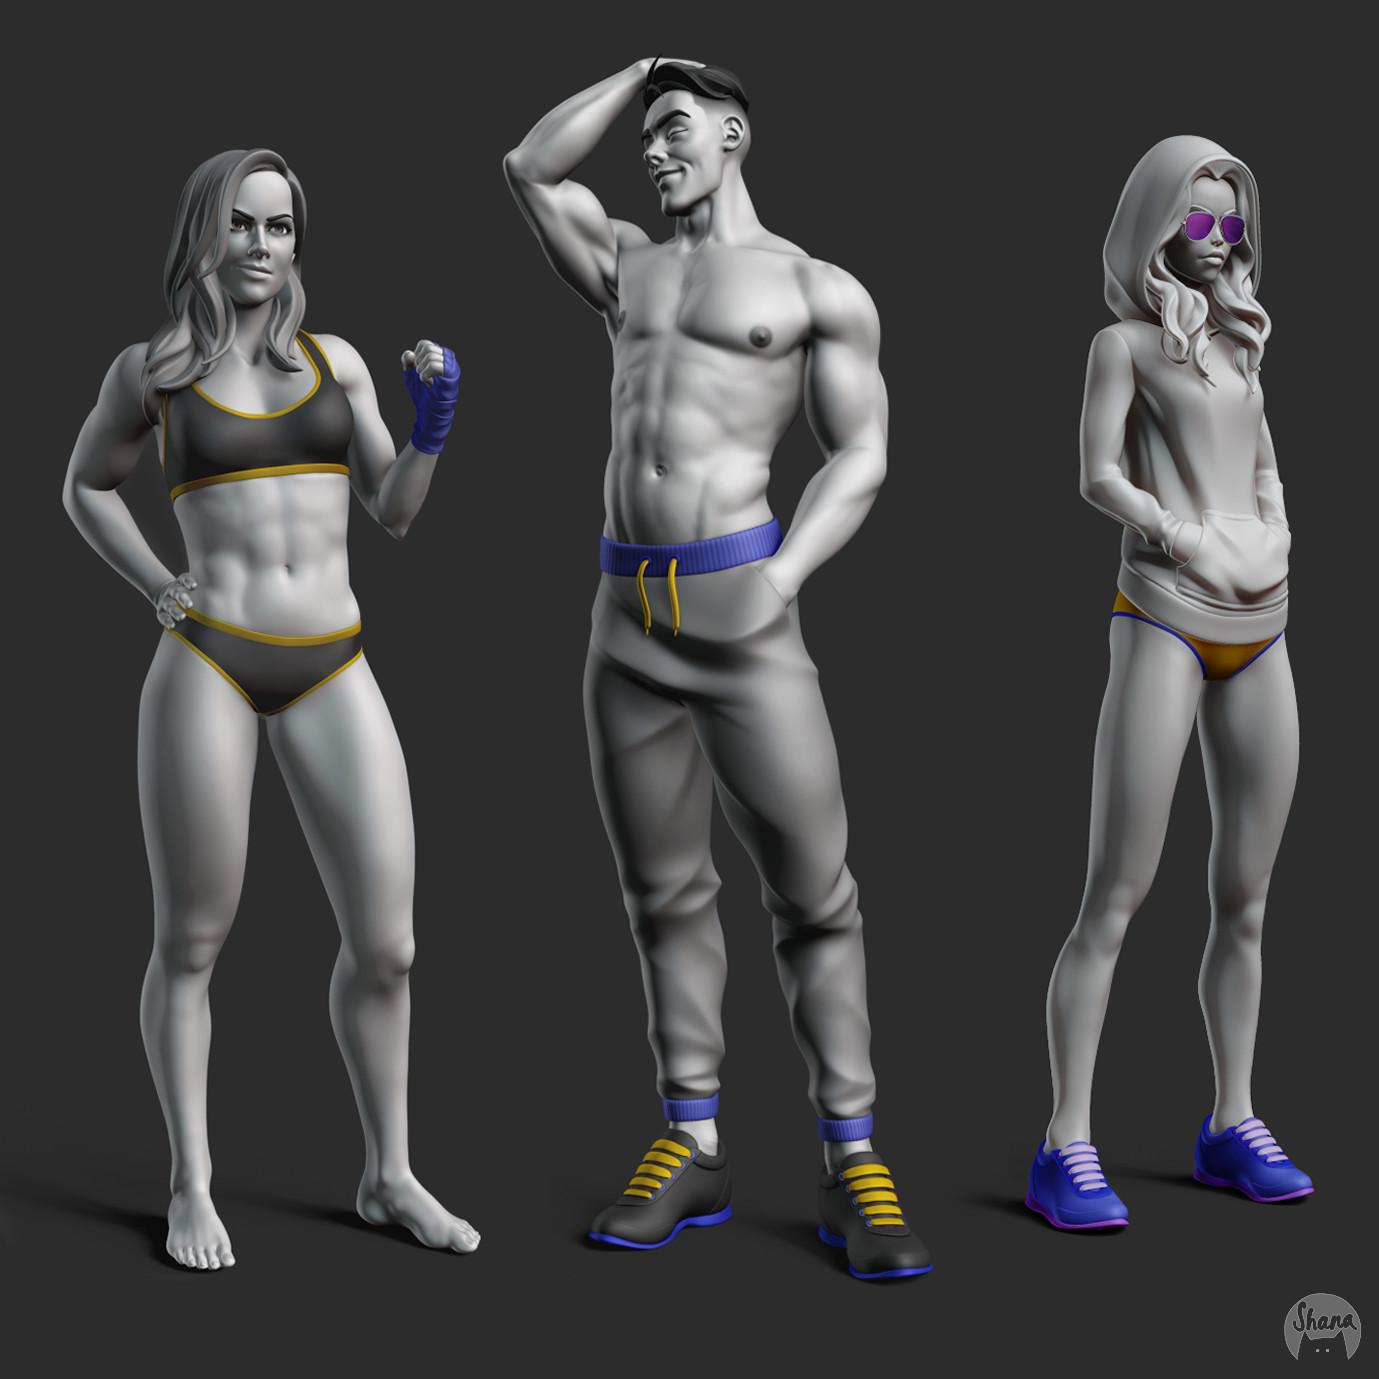 Shana vandercruysse anatomy comp